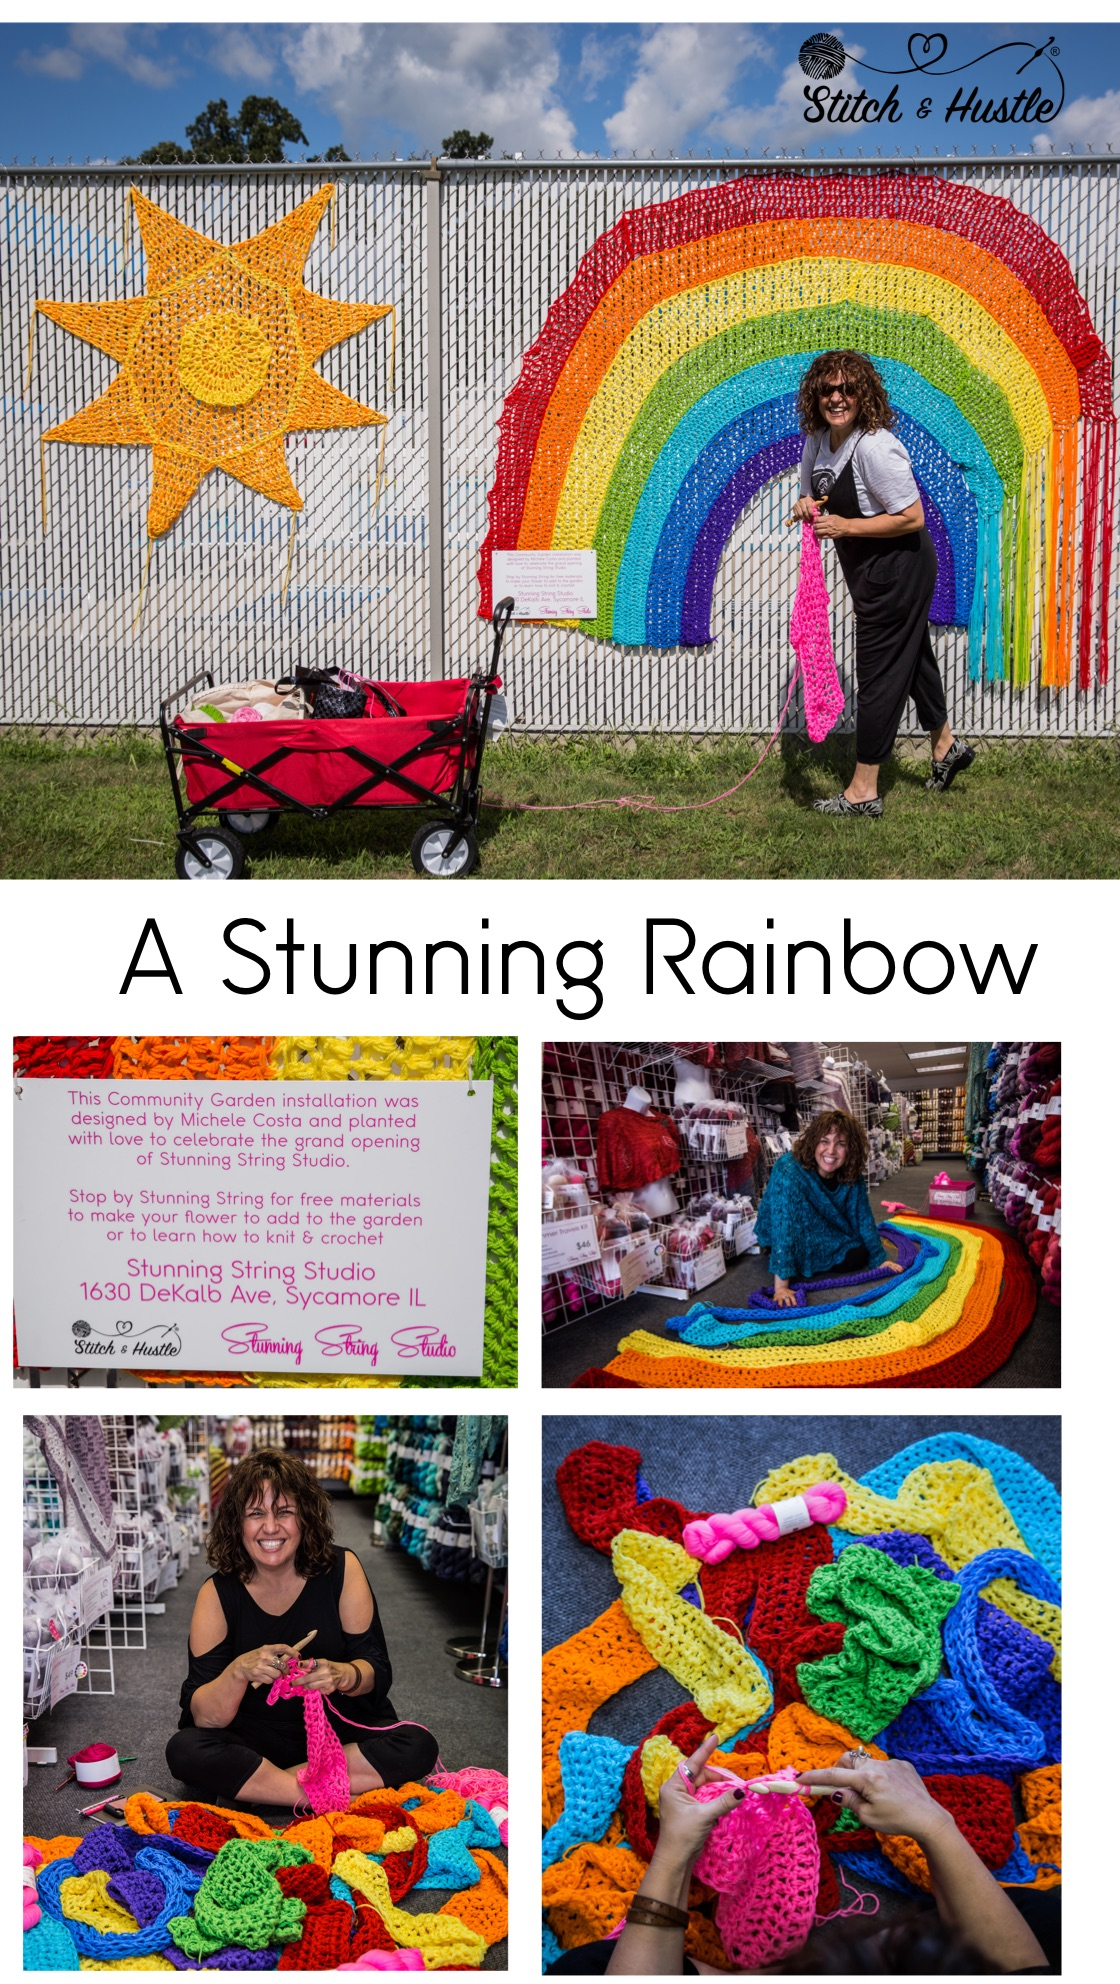 Stunning_string-rainbow-crochet-yarn-bomb-4.jpg